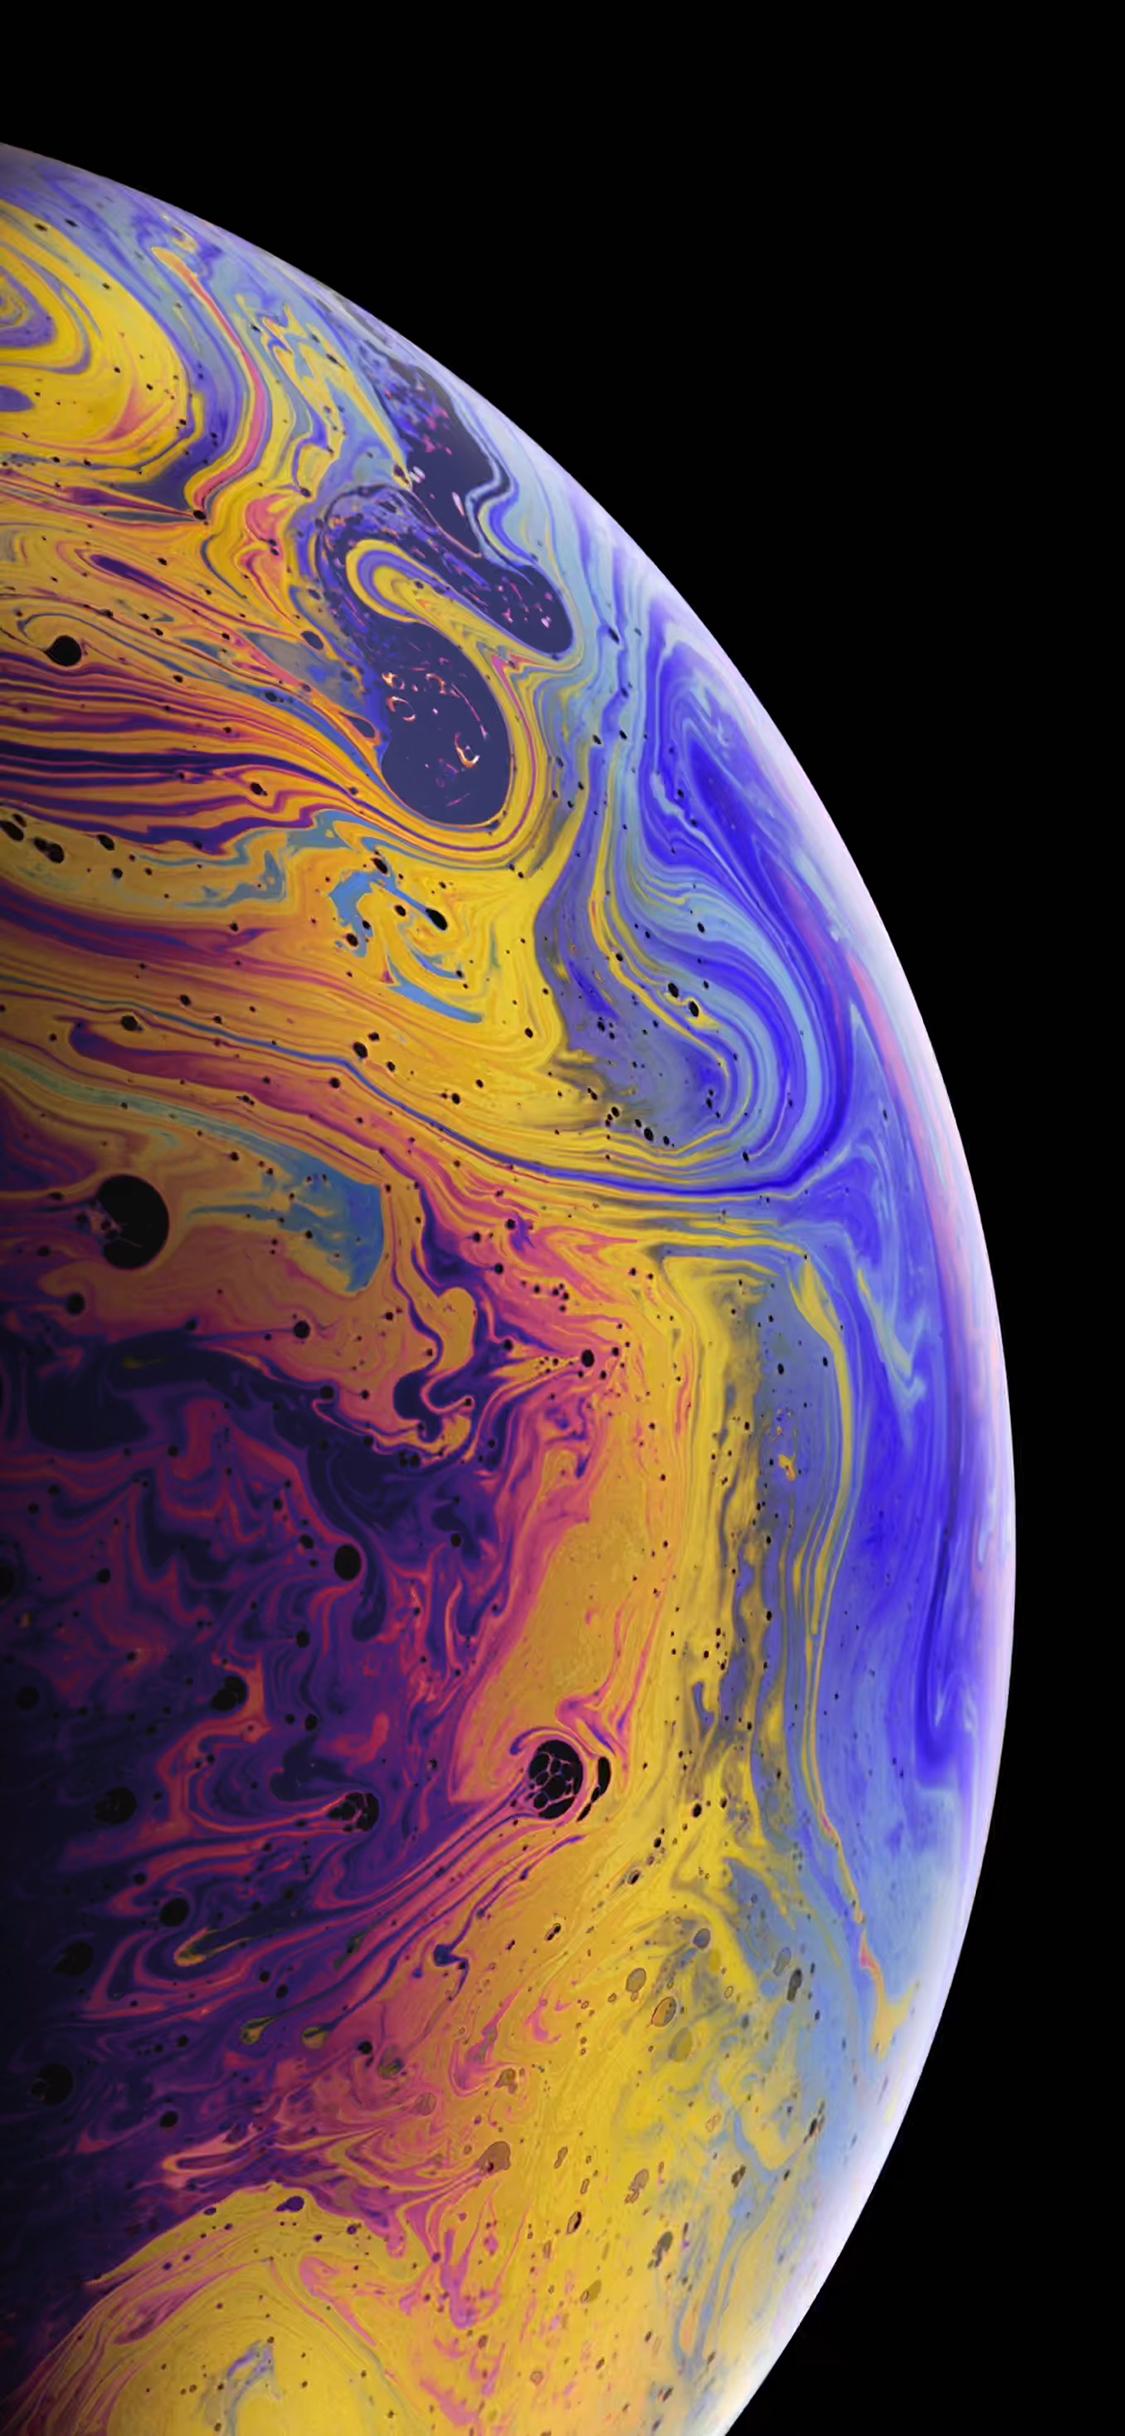 44+ iPhone XS 4k Wallpapers on WallpaperSafari